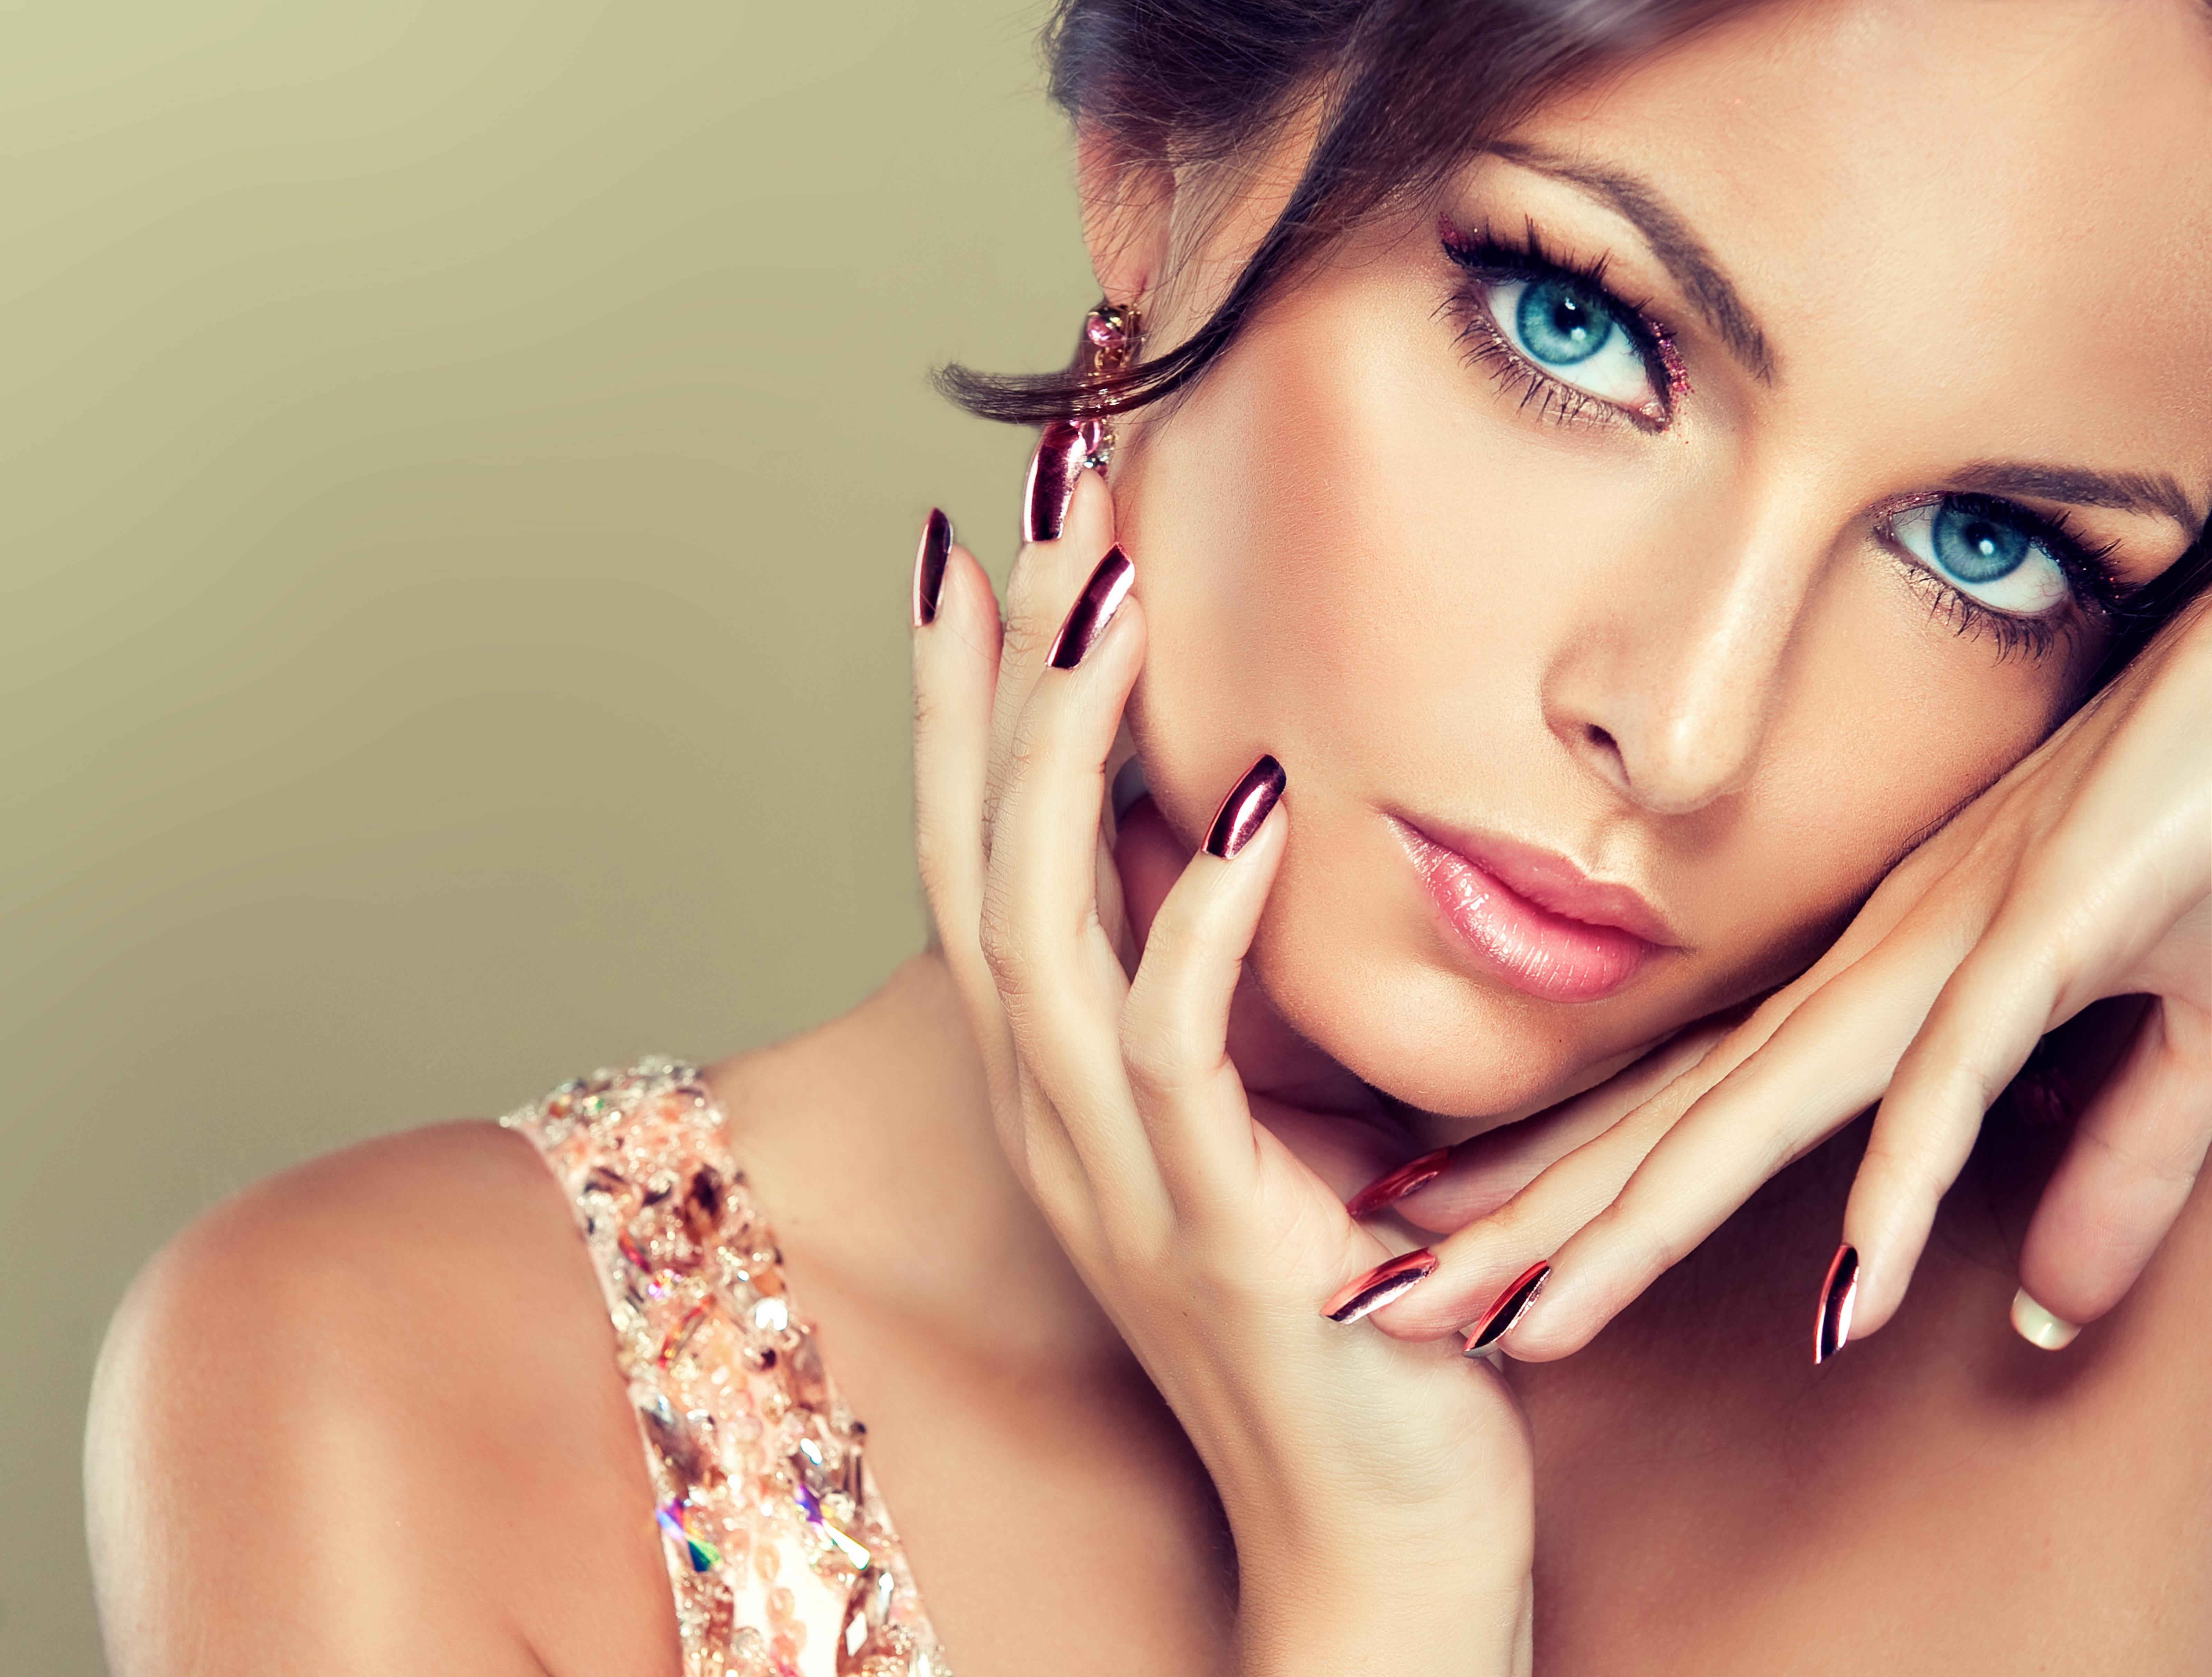 Открытки, картинки про красоту девушки